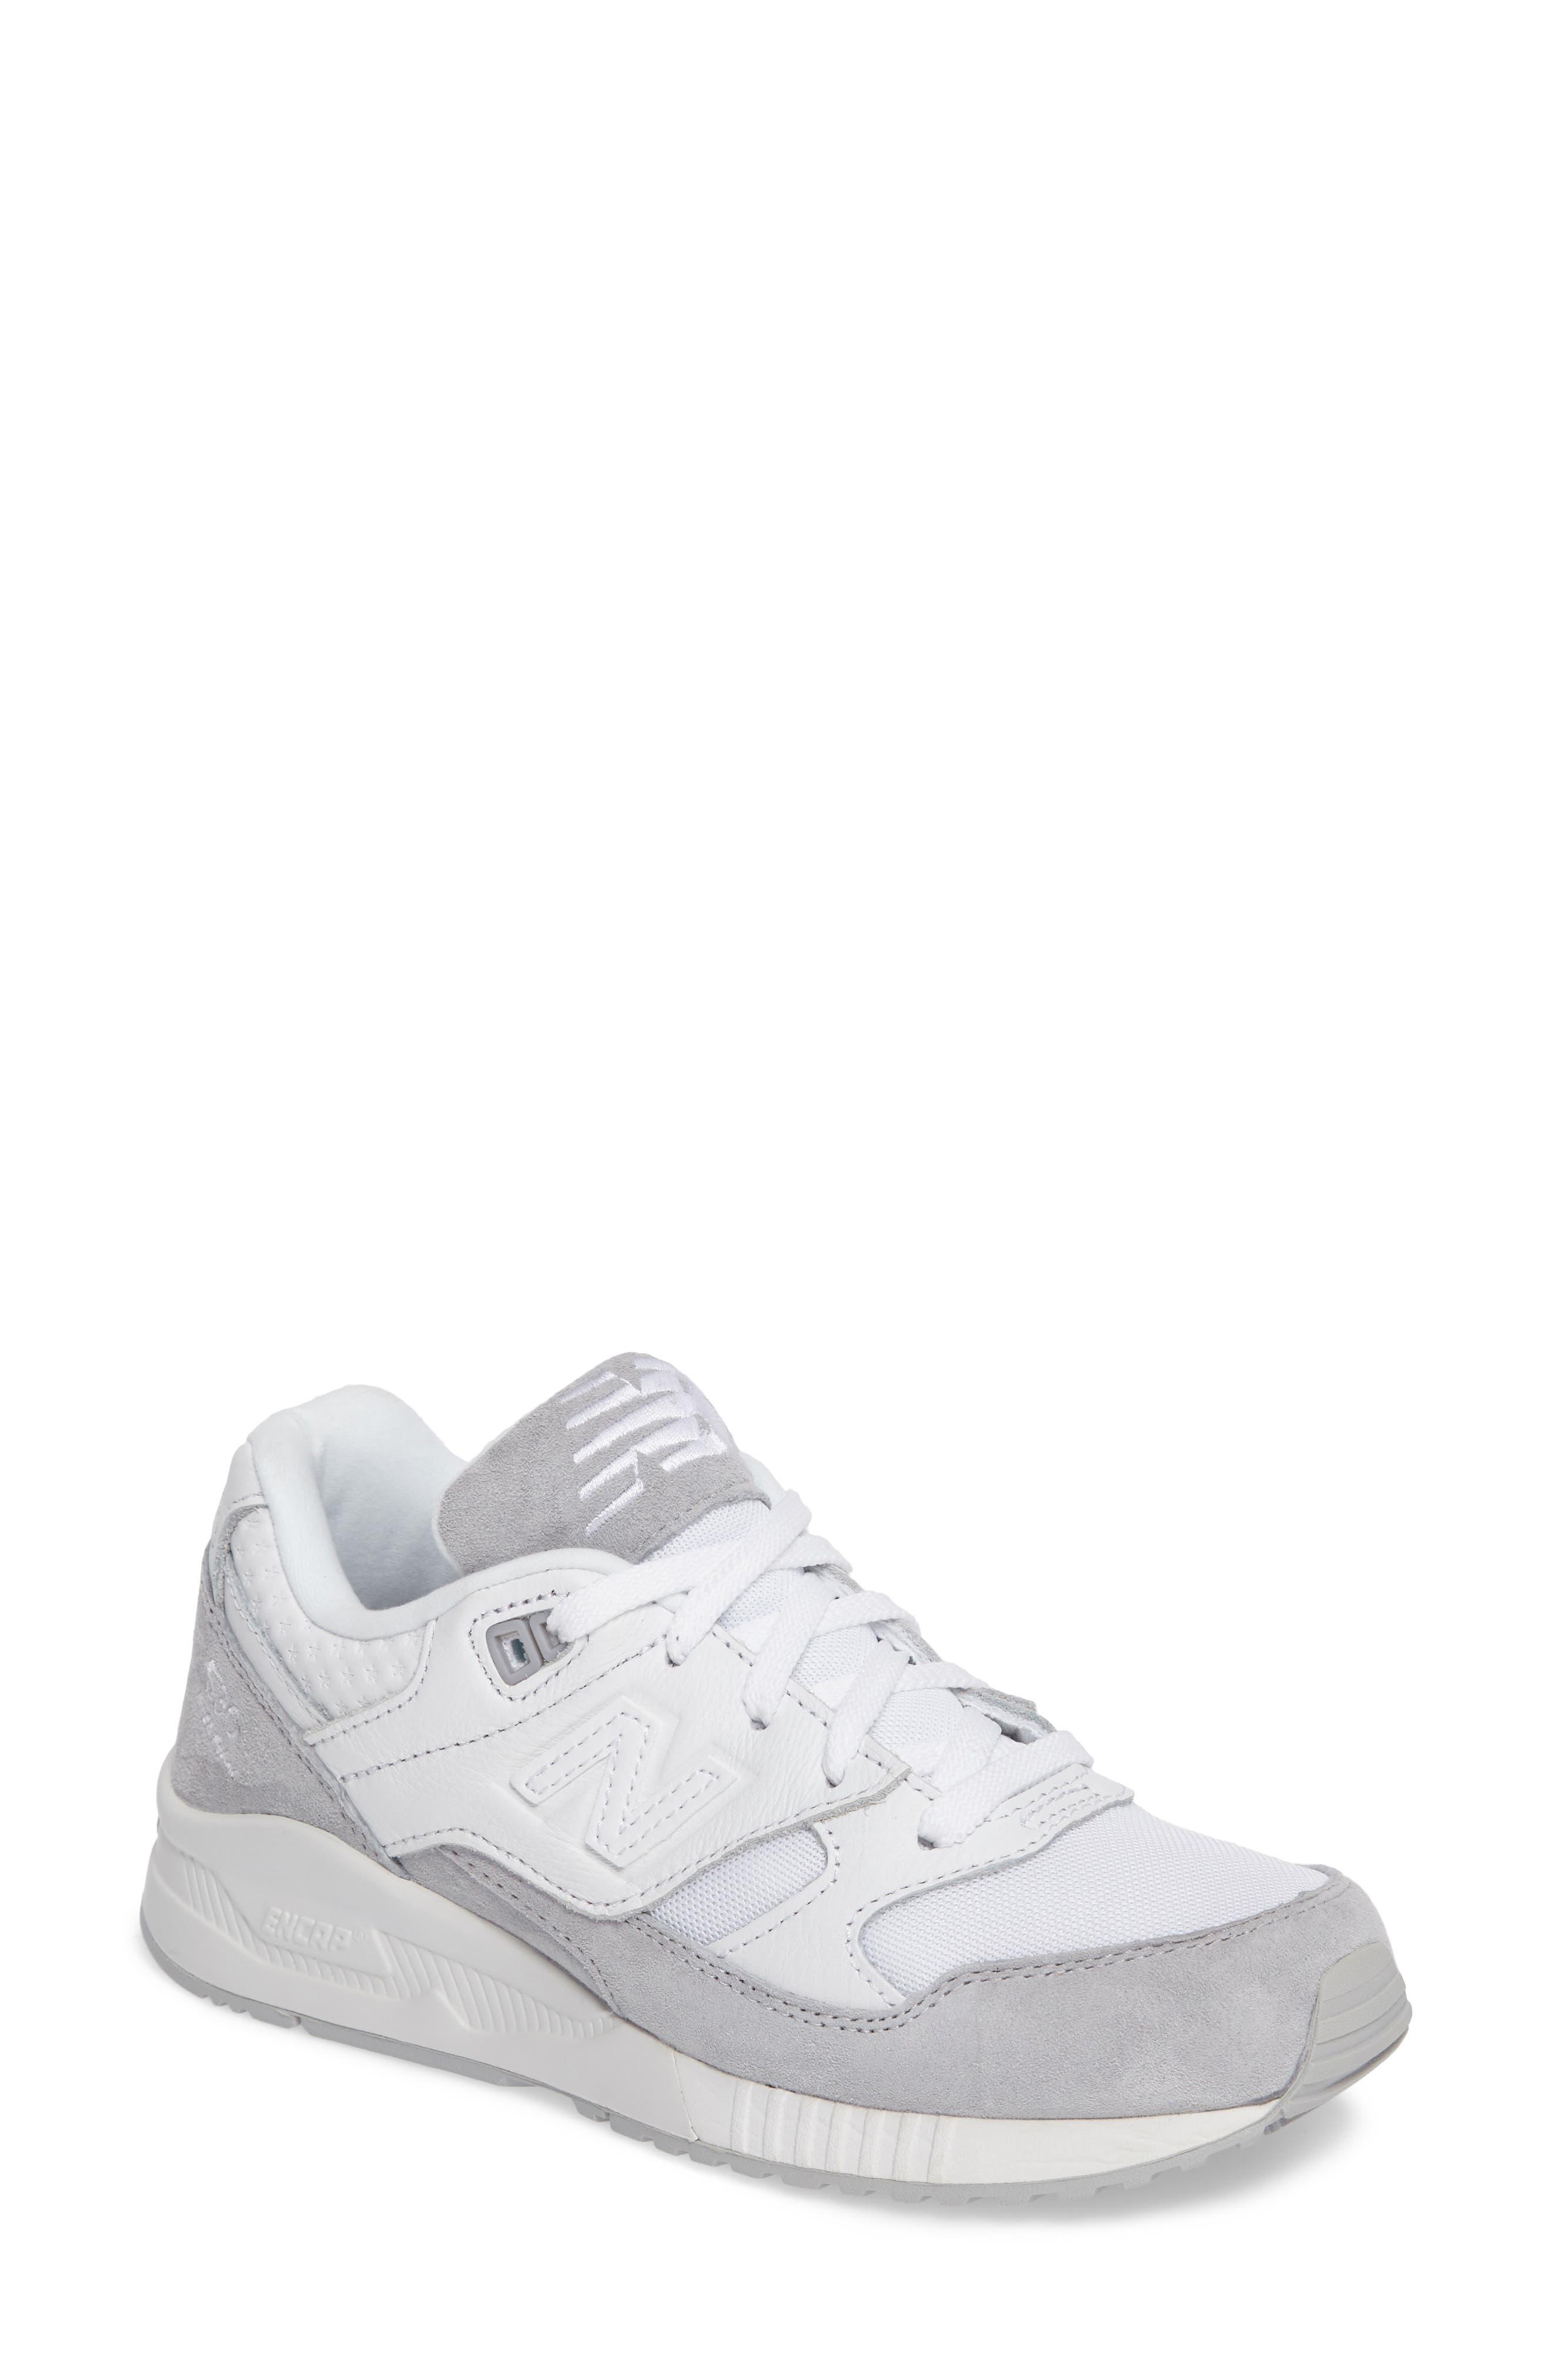 Alternate Image 1 Selected - New Balance '530' Sneaker (Women)